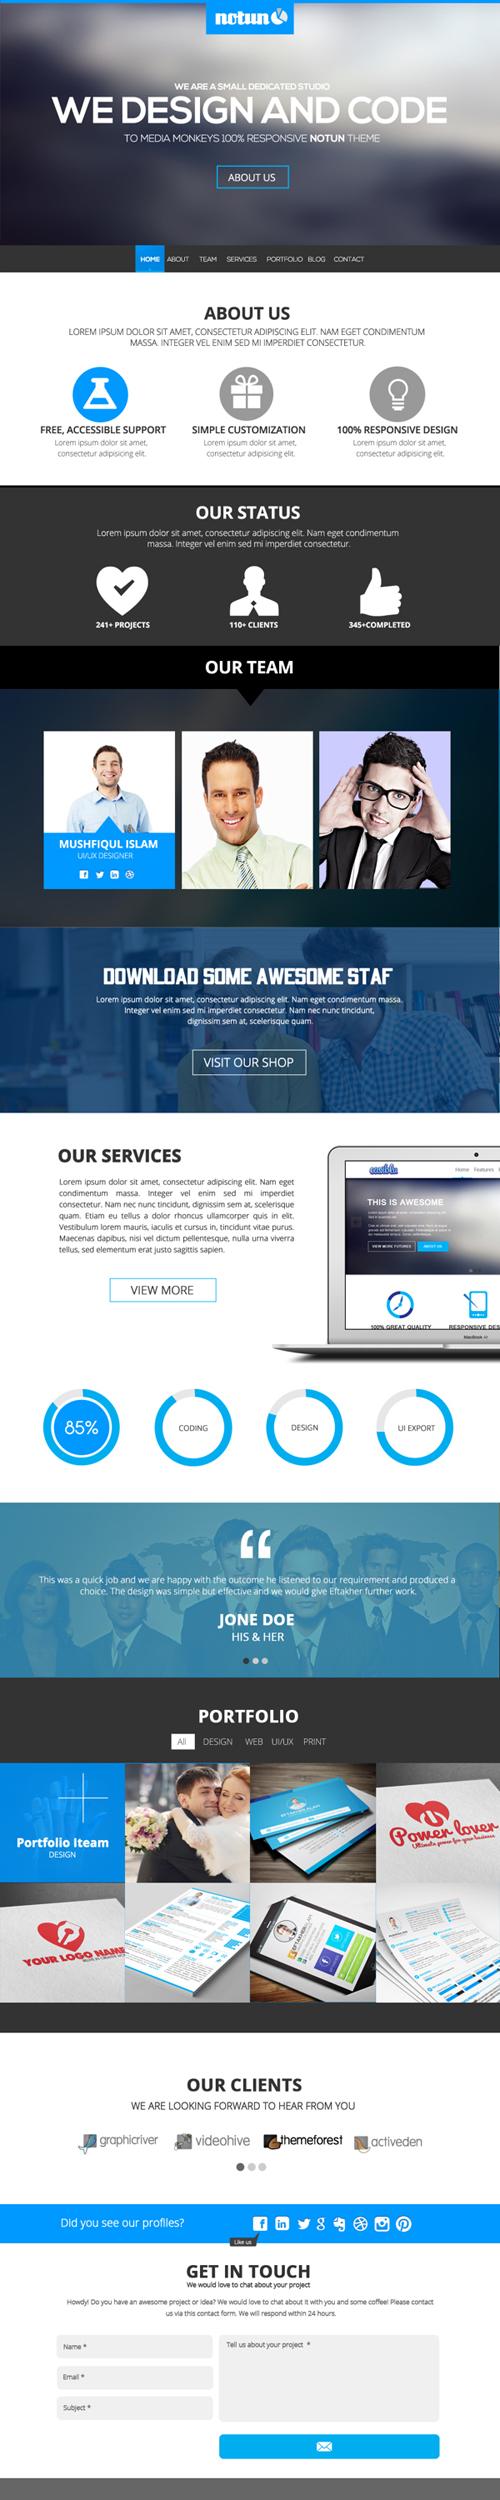 One Page Psd Web Template Free Download Freepsdfiles Photoshoppsd Uikits Psdtemplates Vectorgraphi Psd Templates Free Web Template Free Download Photoshop